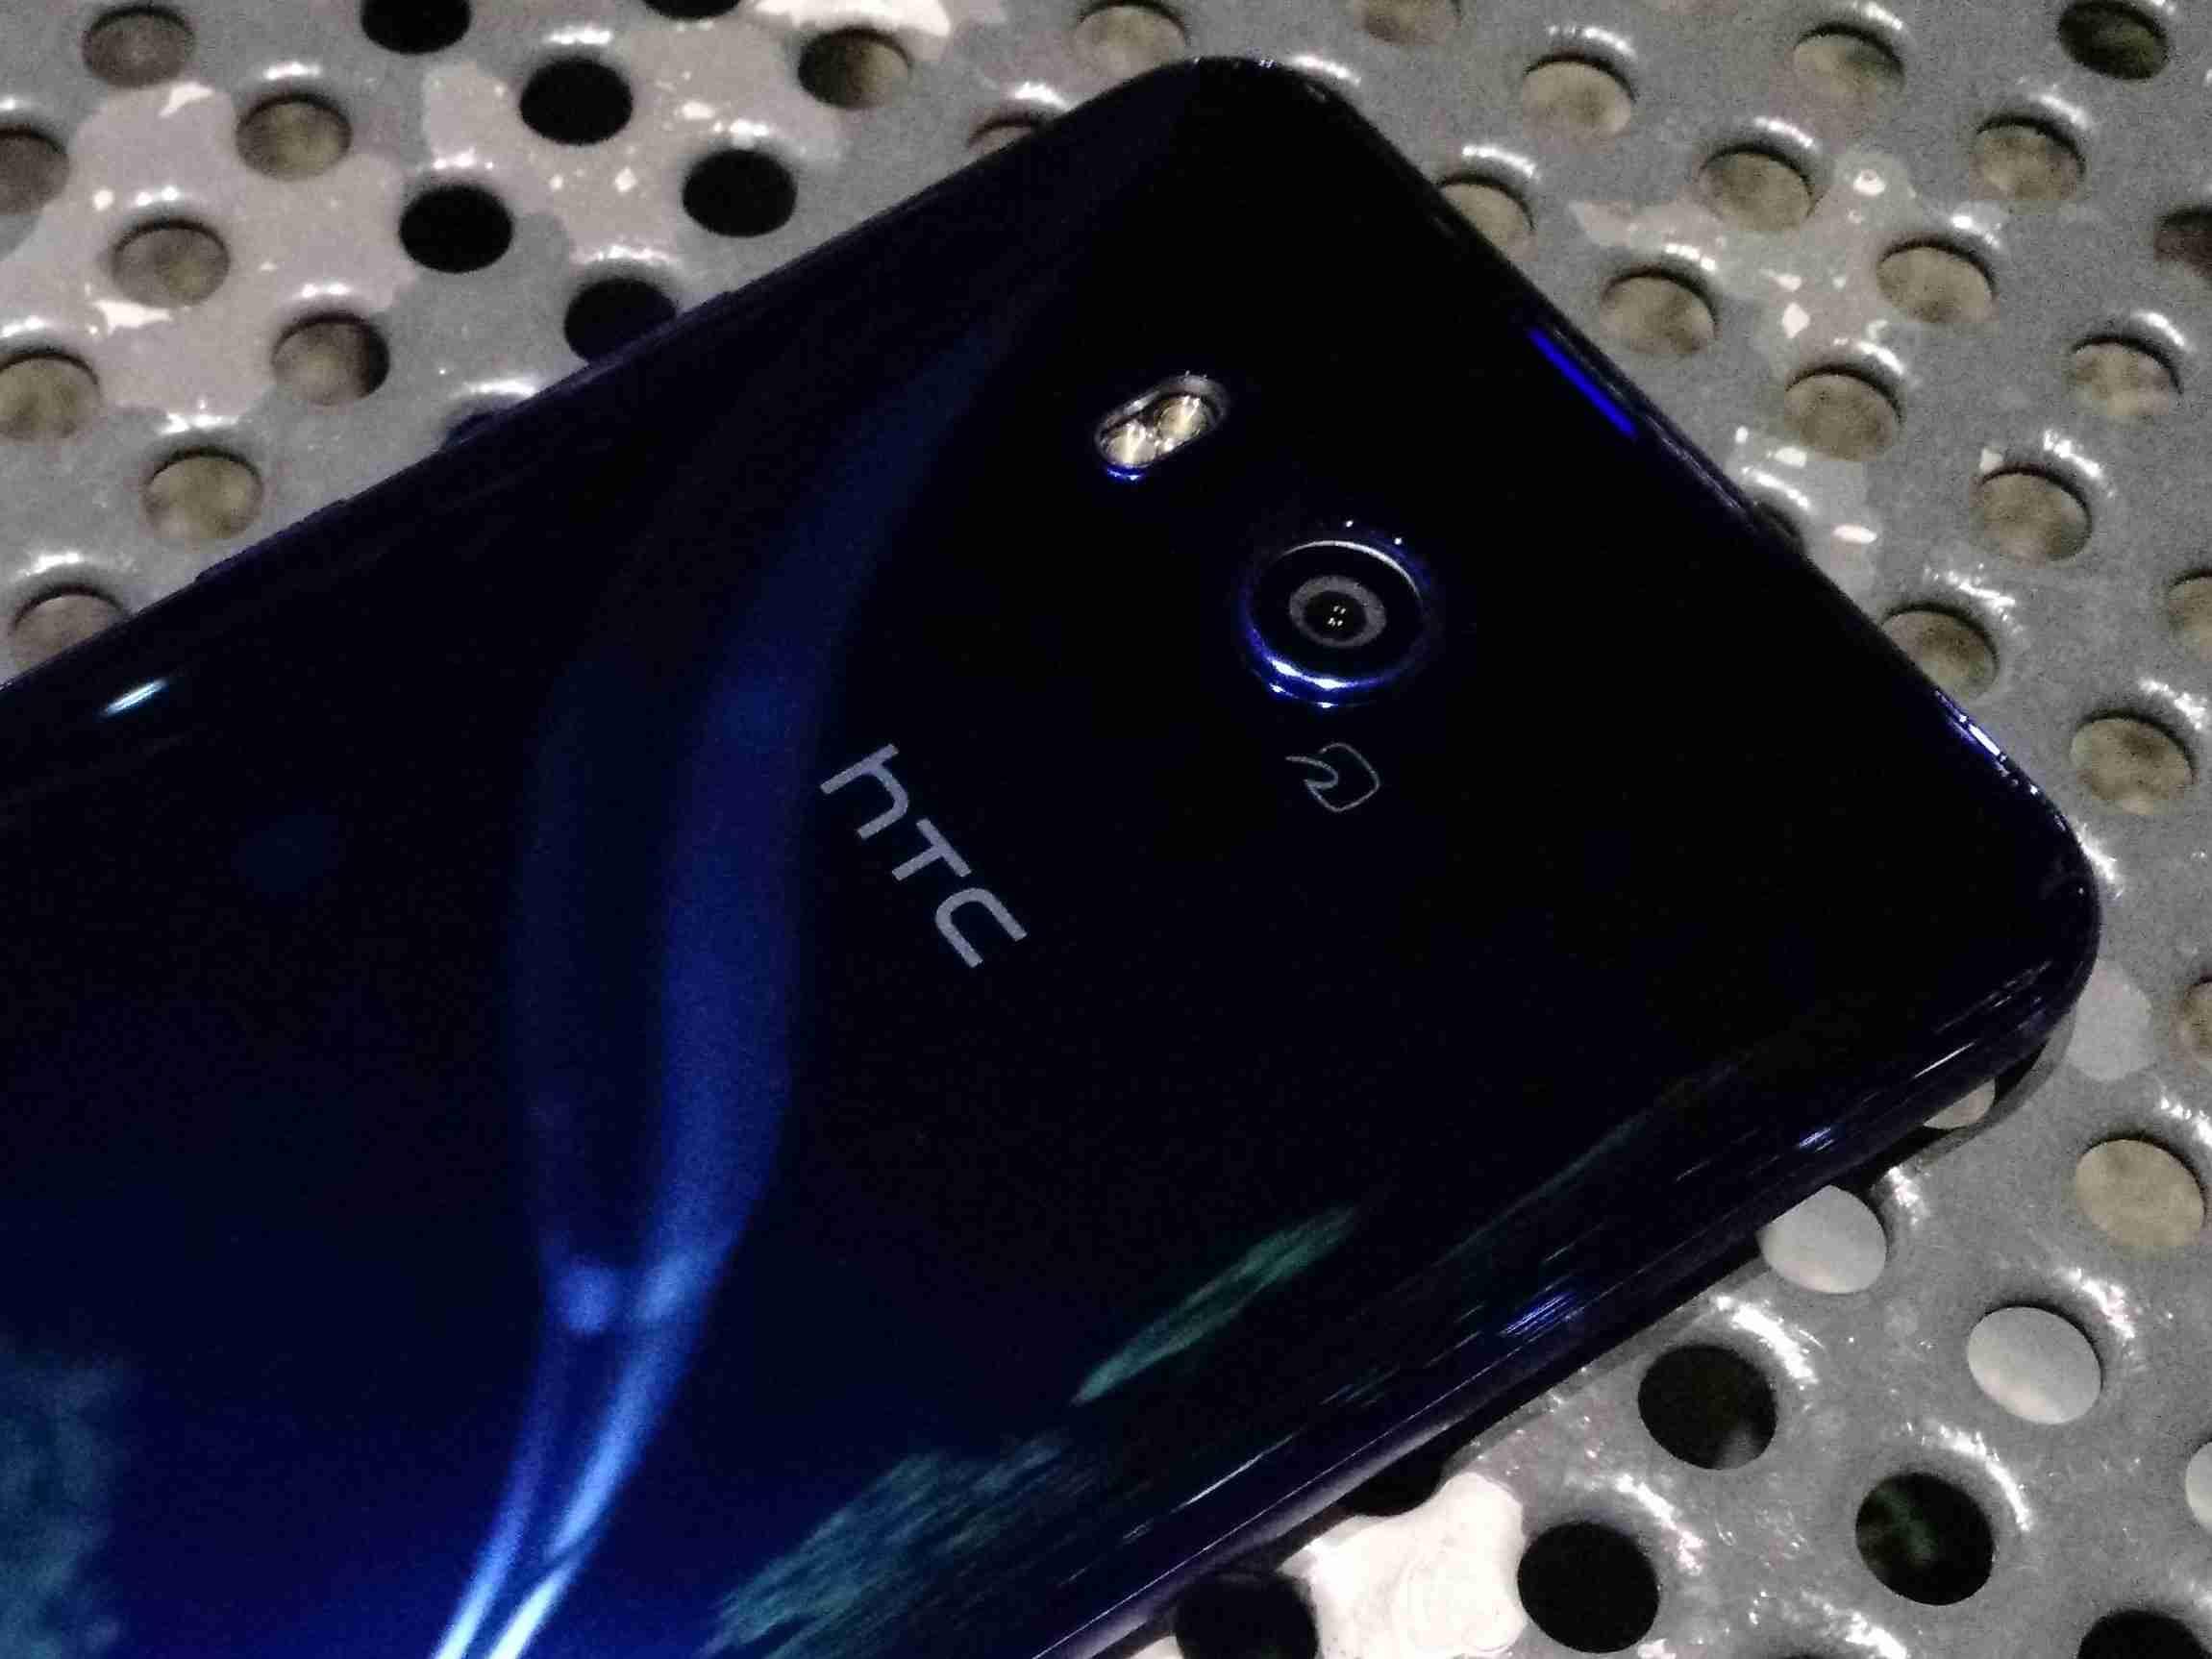 DxOMark Mobile世界一を更新した「HTC U11」のカメラの実力は?